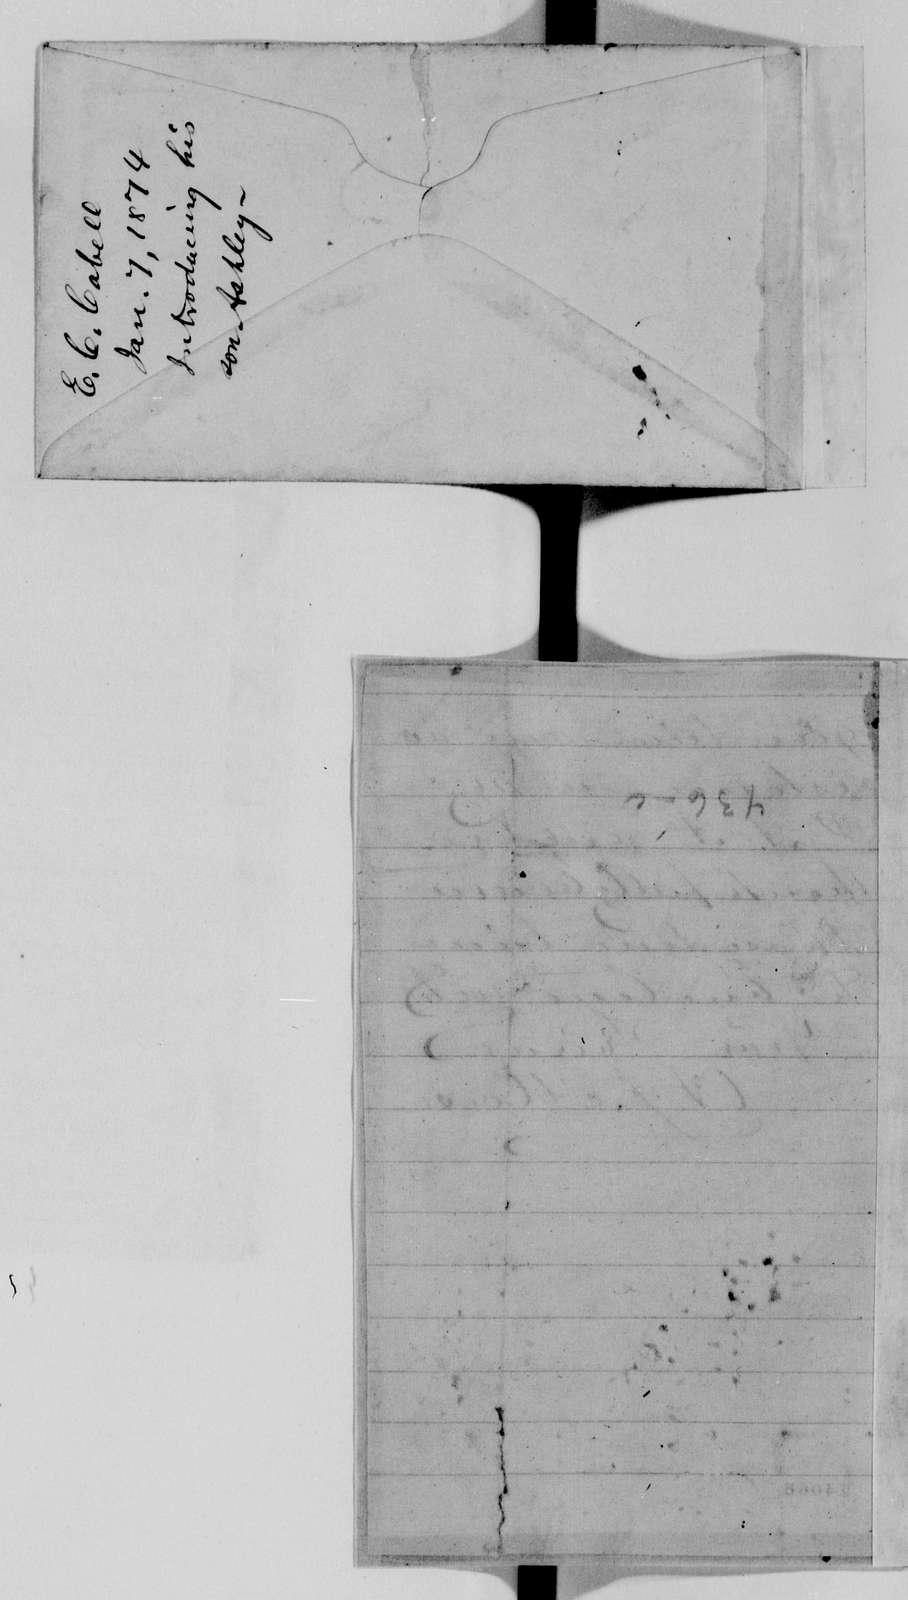 Alexander Hamilton Stephens Papers: General Correspondence, 1784-1886; 1873, Dec. 16-1874, Jan. 18